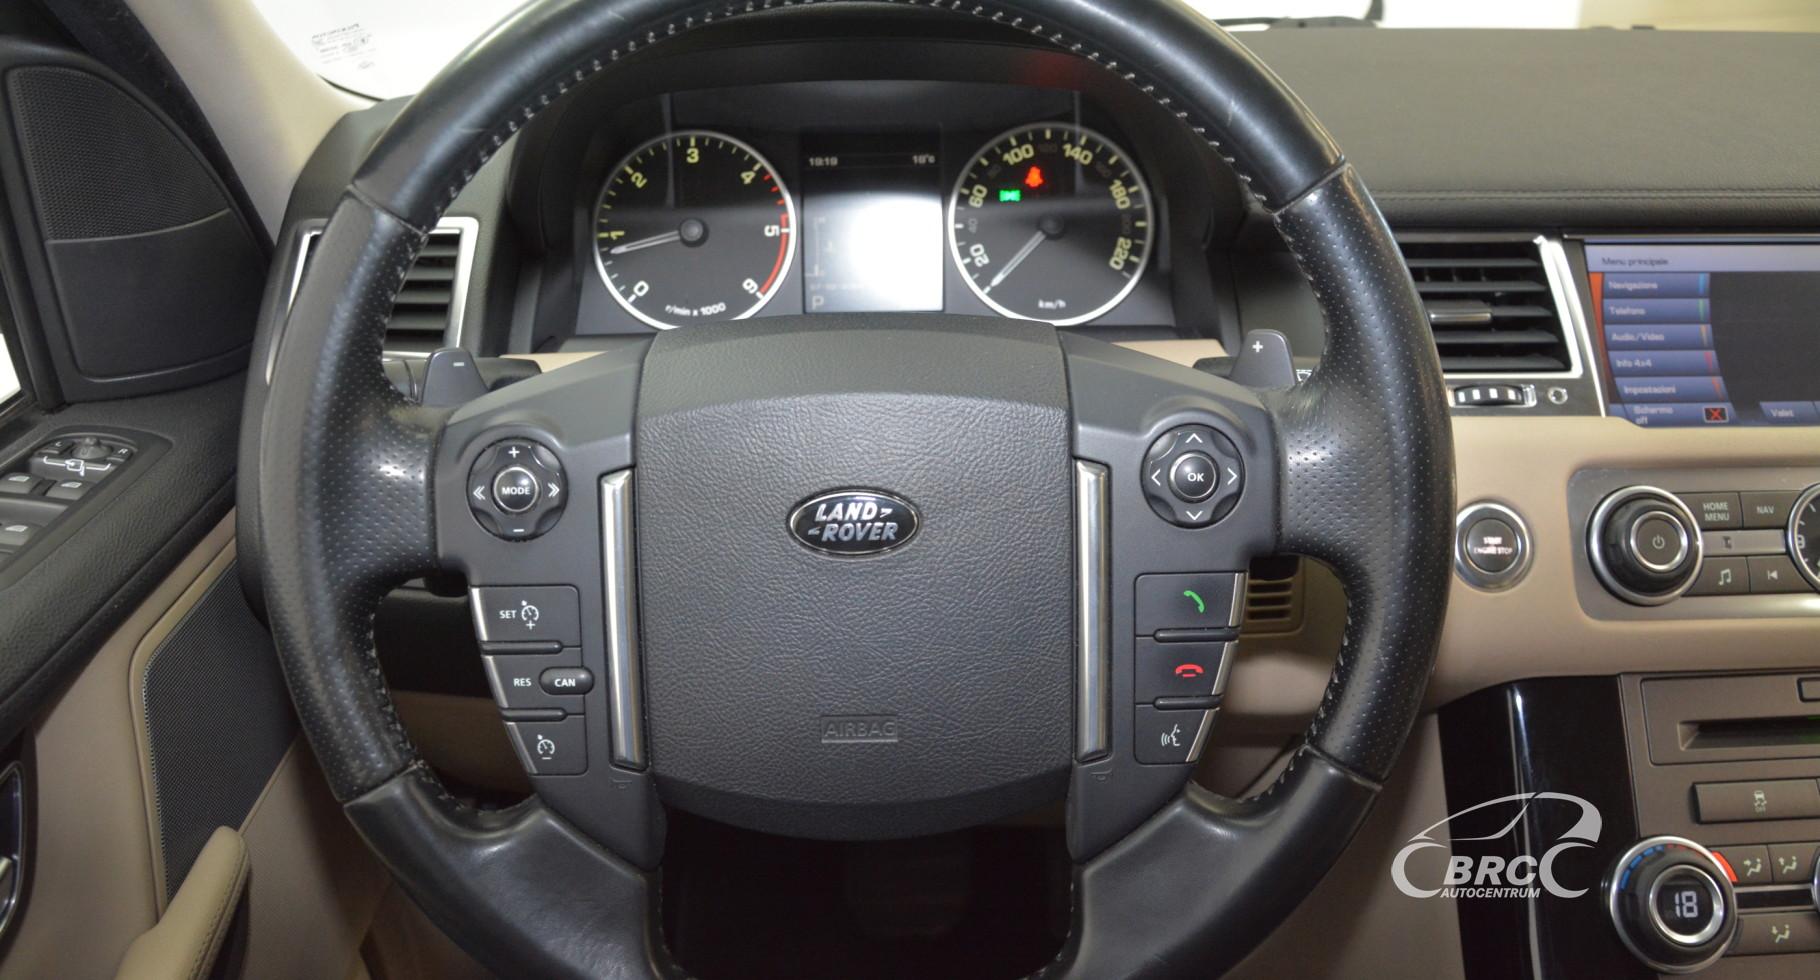 Land-Rover Range Rover Sport TDV6 HSE Automatas